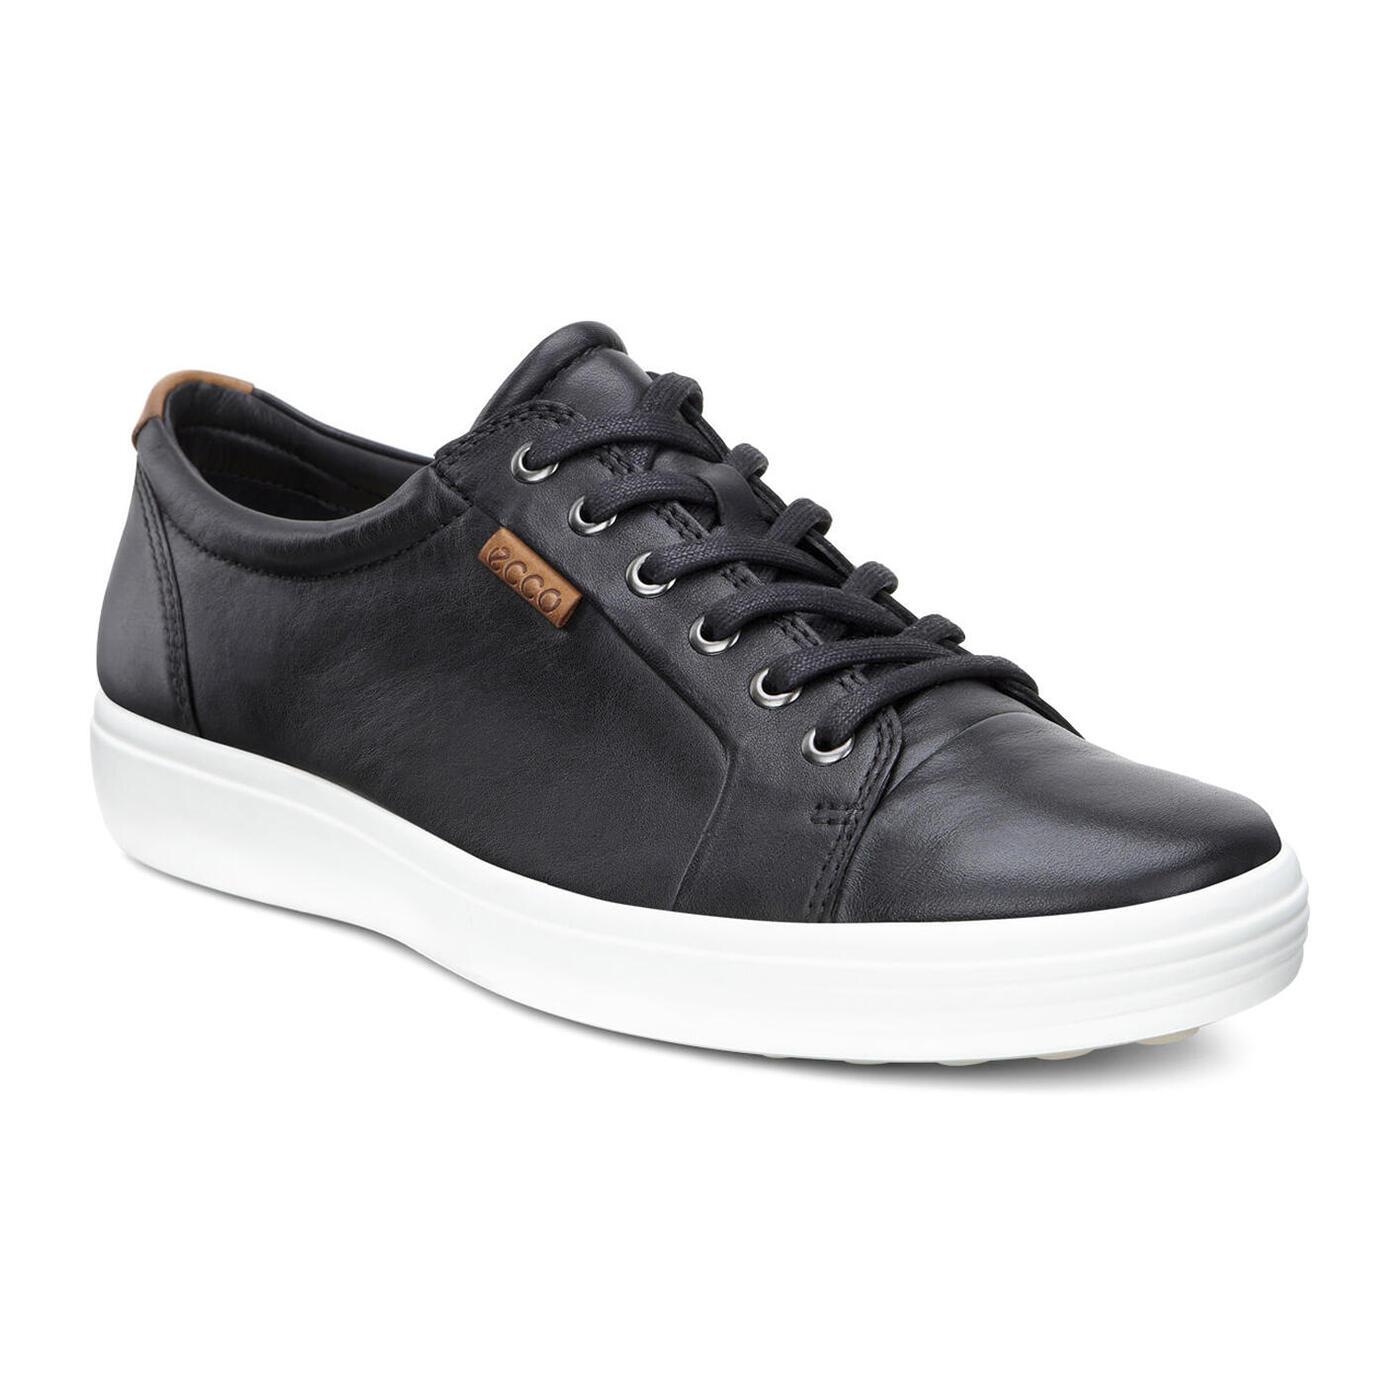 Ecco Soft 7 sneakers, black, 47